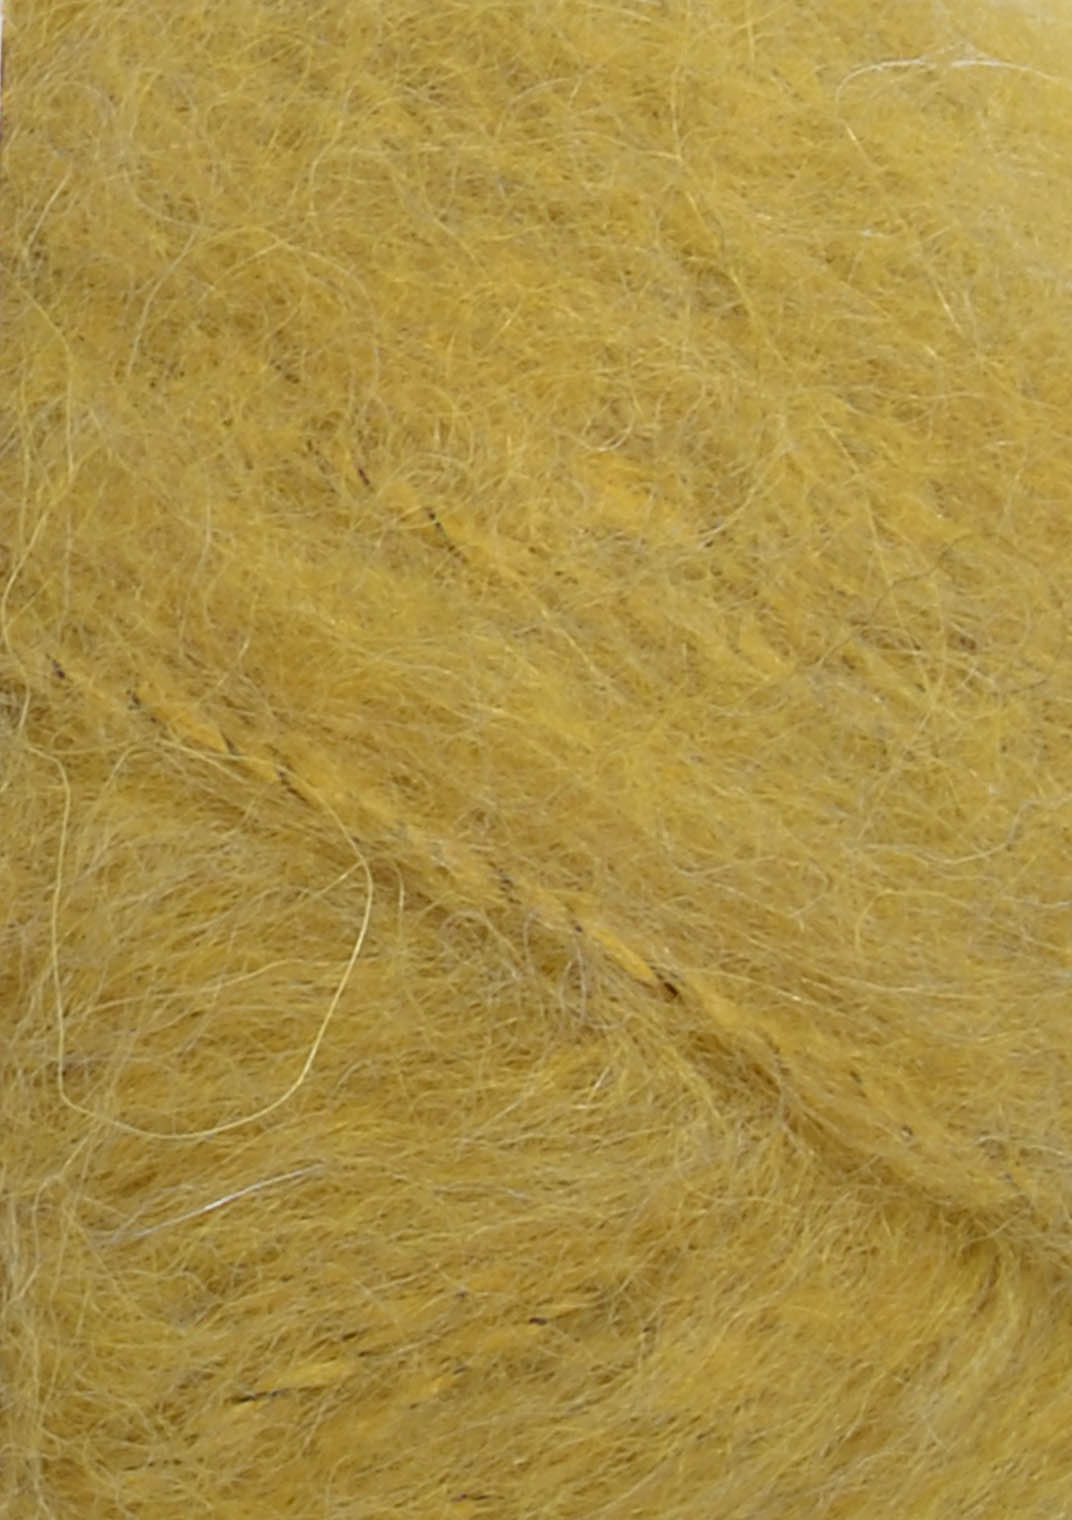 Børstet Alpakka, Brushed Alpakka, Corn Yellow 2024, Sandnes Garn in the US, Sandnes Garn in USA, Sandnes Norwegian yarn